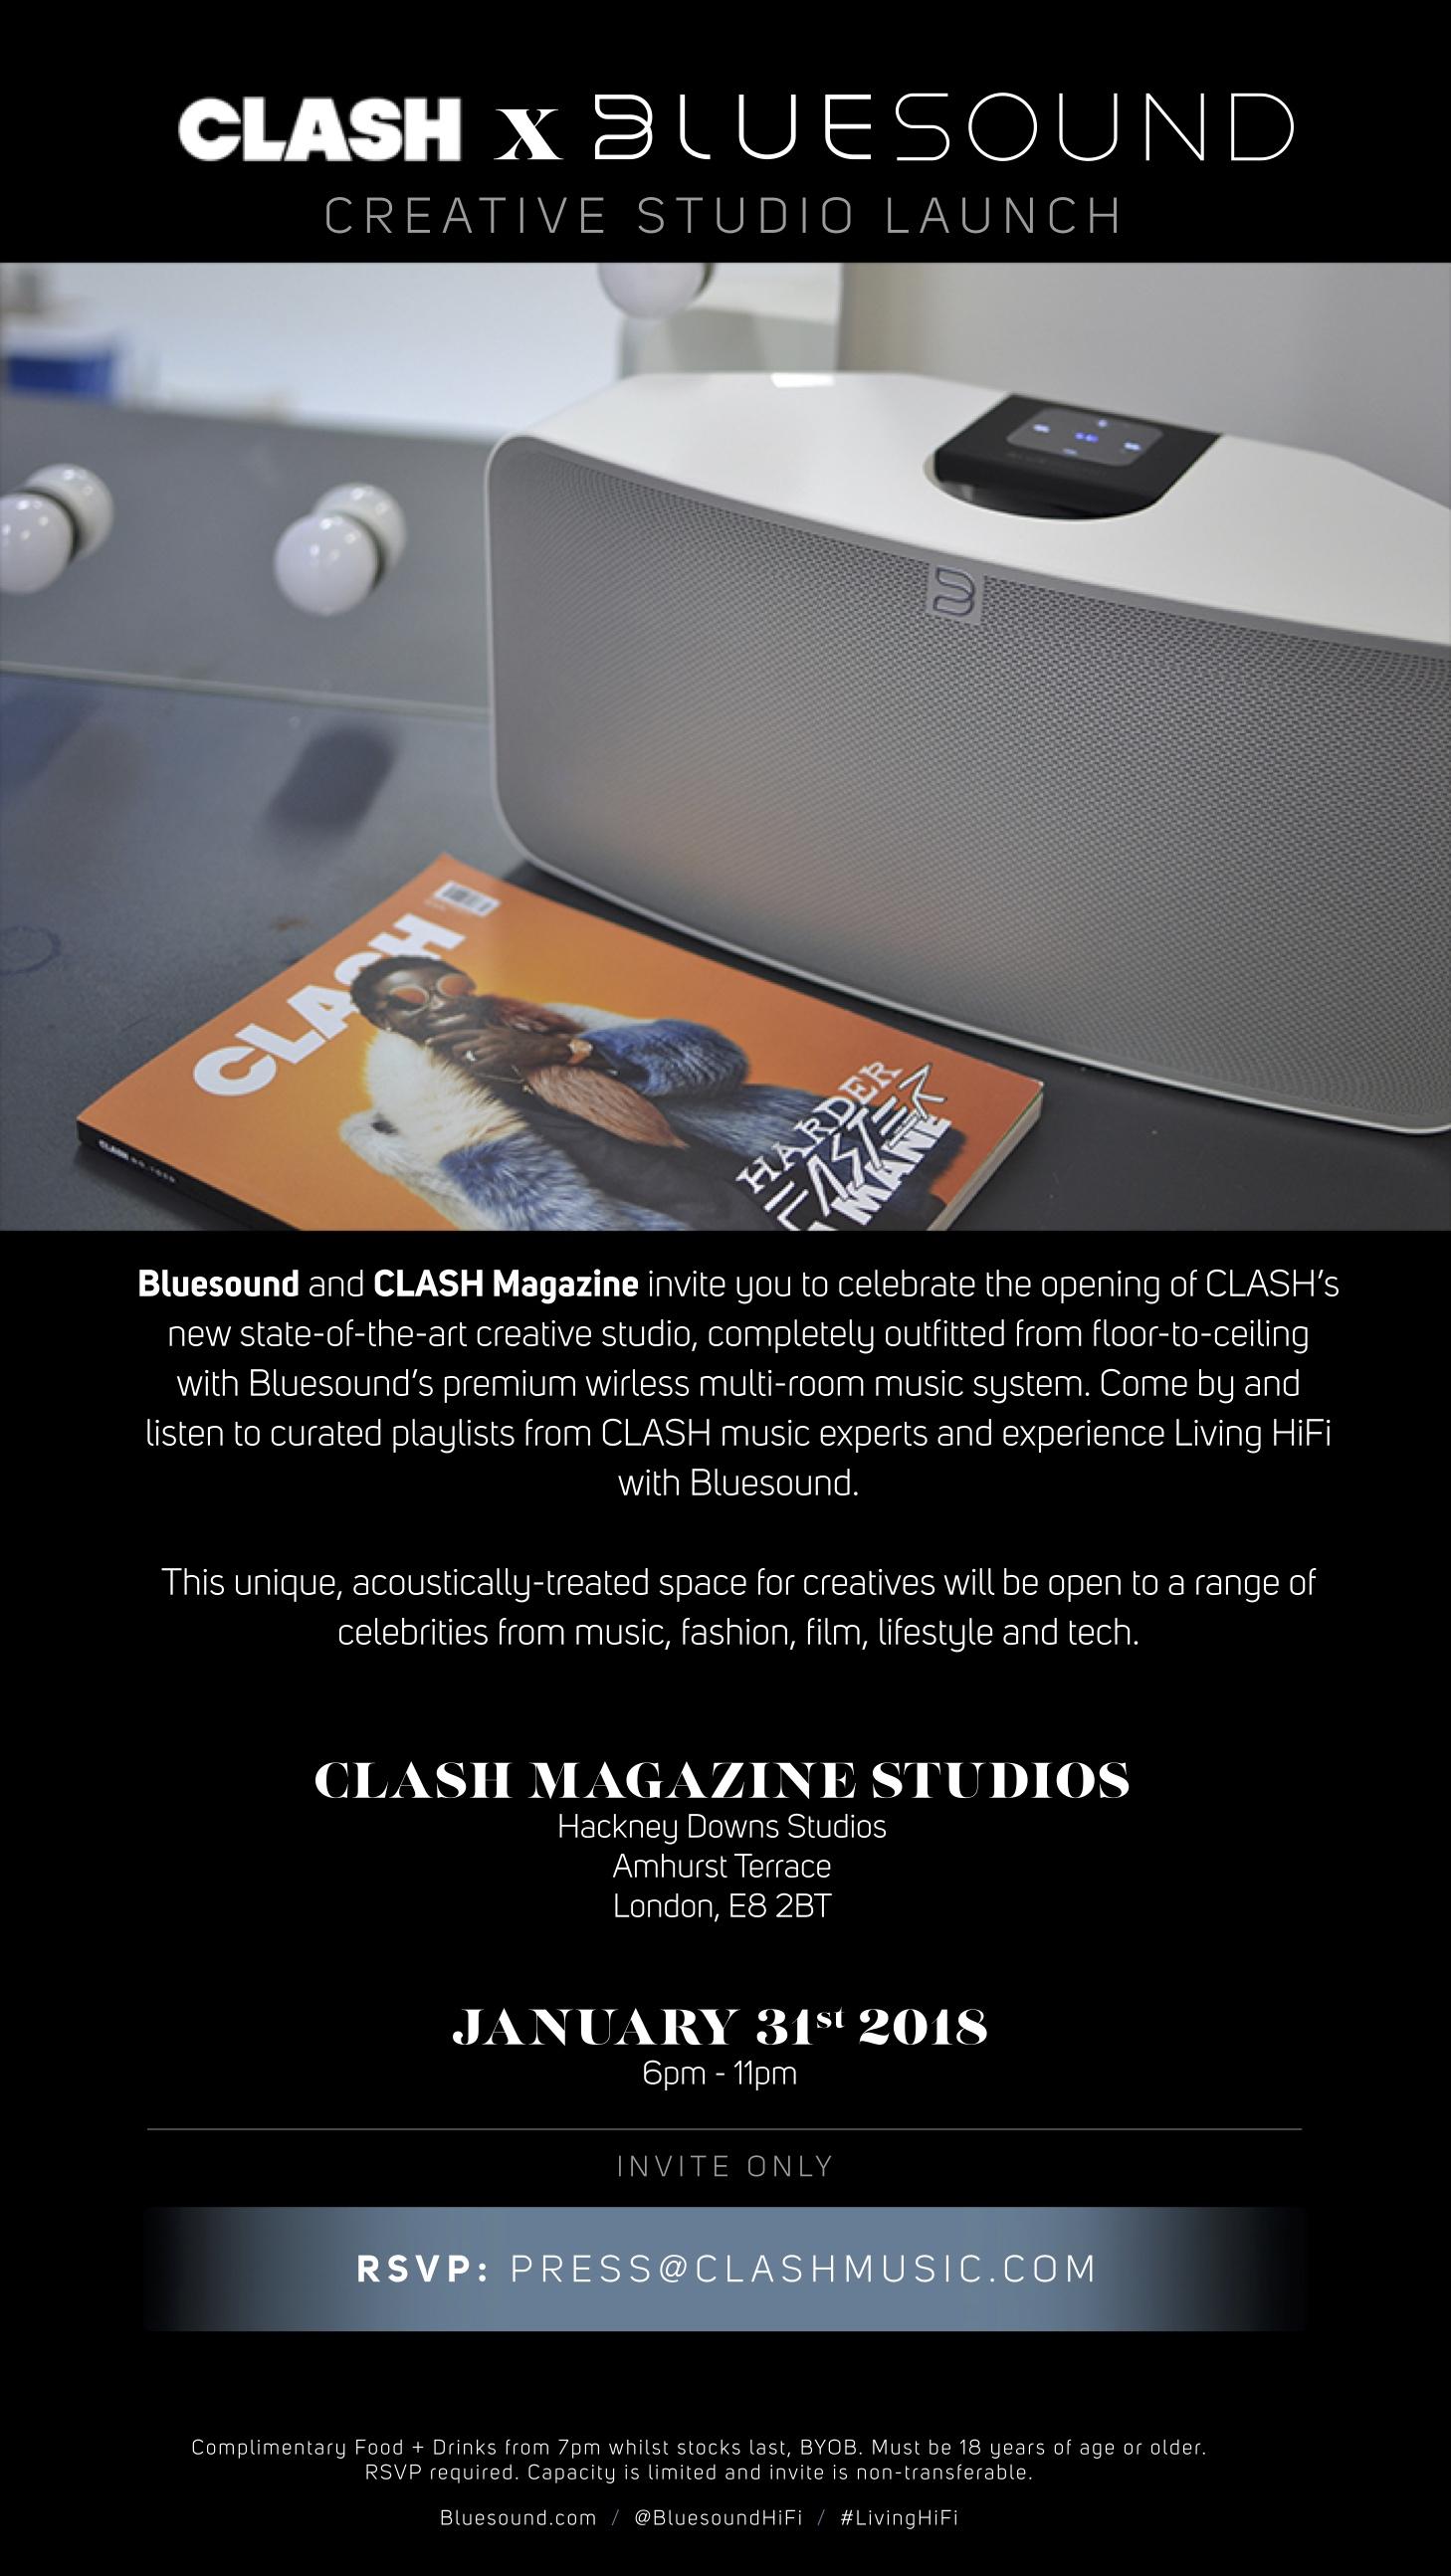 Bluesound_CLASH Studios.jpg